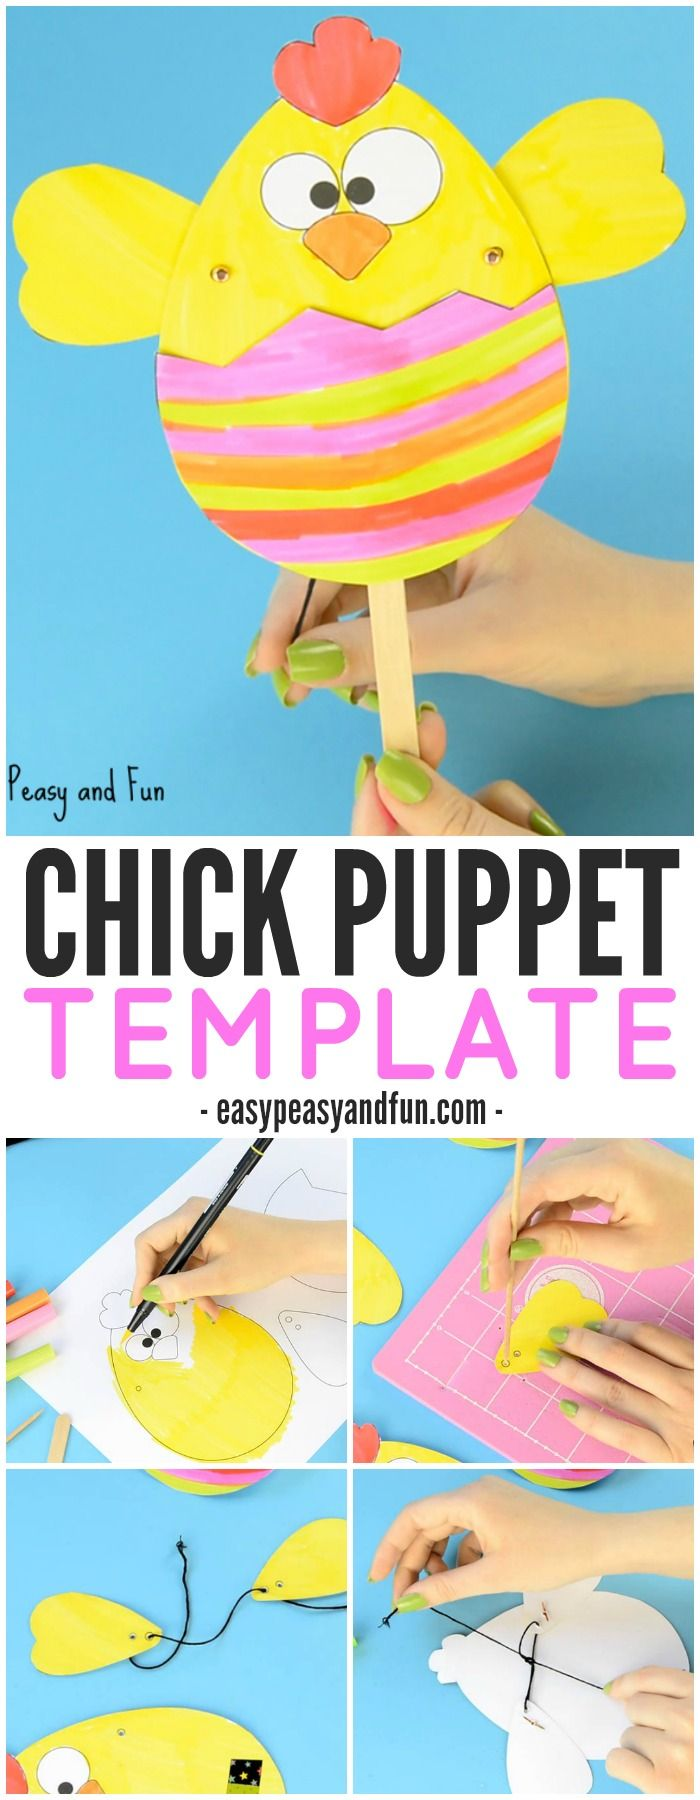 Paper Chick Puppet Craft Template – Fun Easter Idea